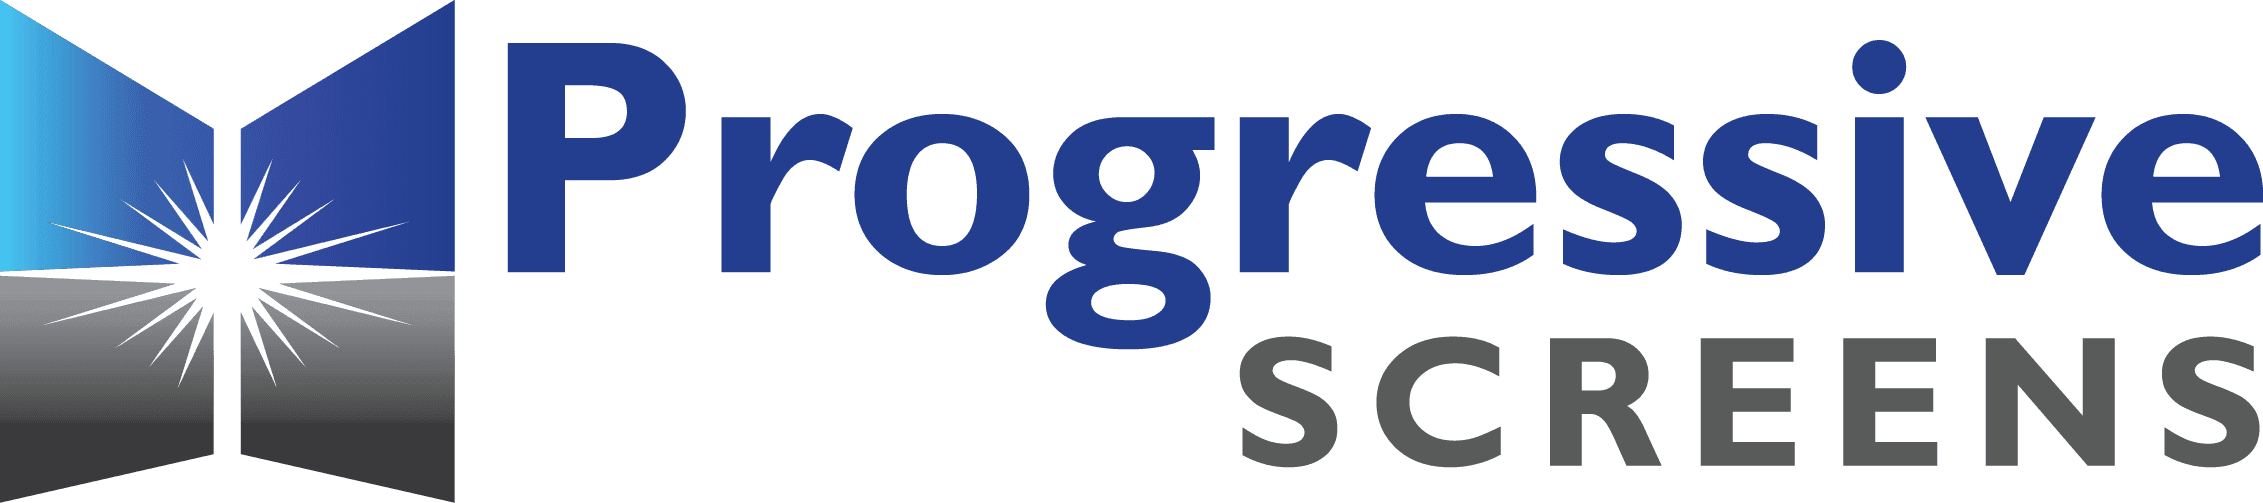 progressive screens logo